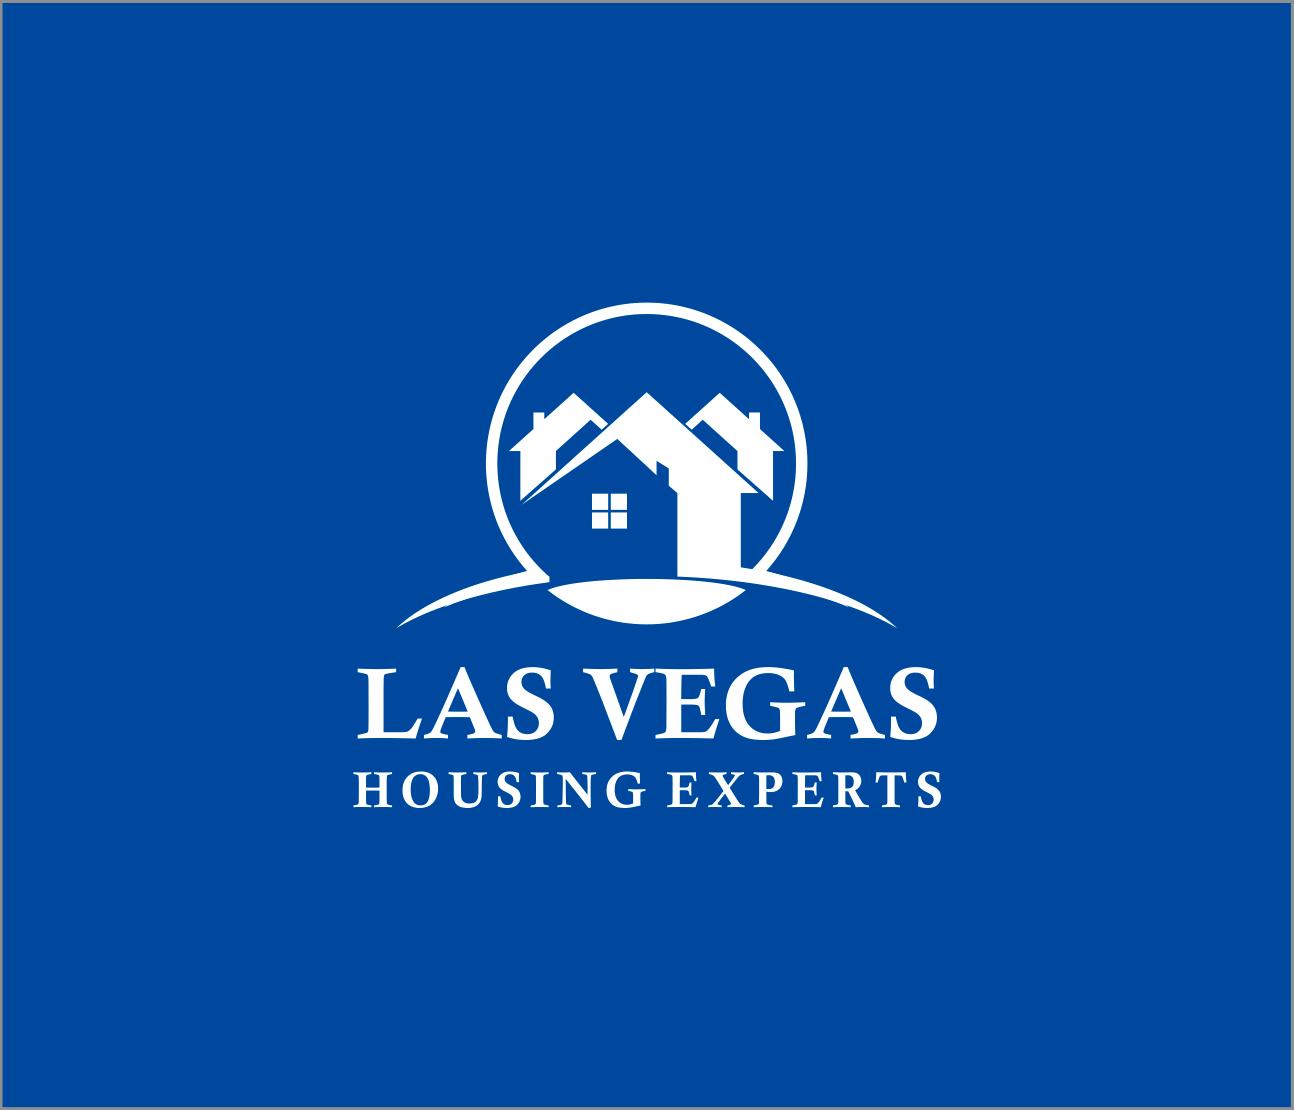 Logo Design by Armada Jamaluddin - Entry No. 123 in the Logo Design Contest Las Vegas Housing Experts Logo Design.